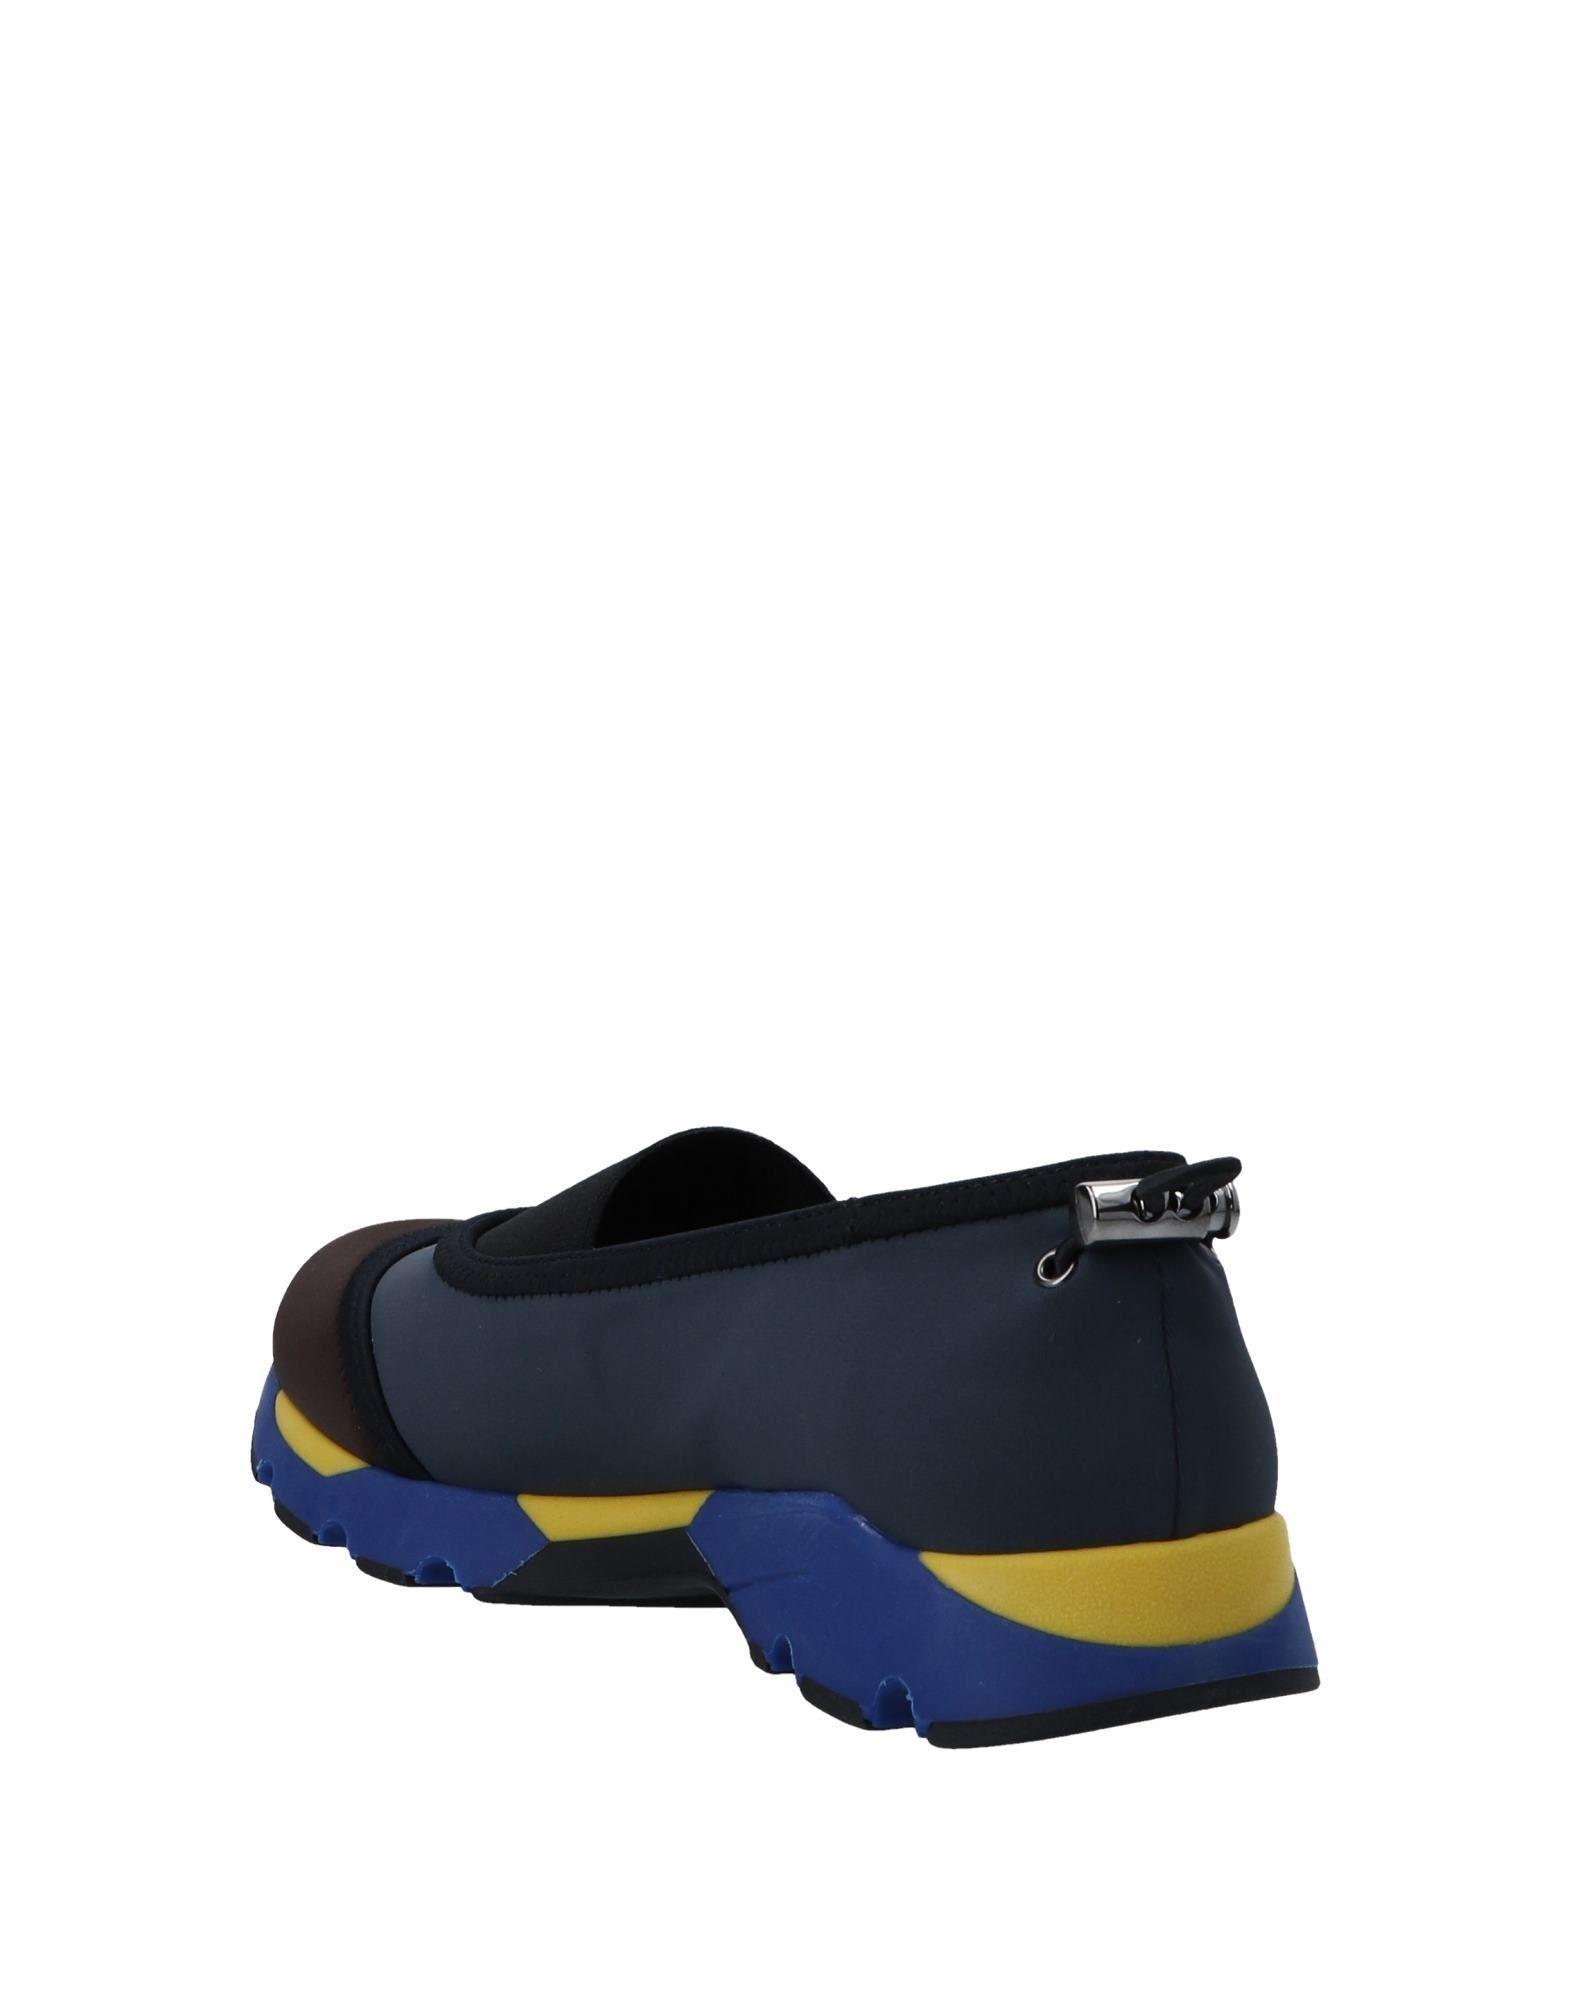 Marni Neoprene Low-tops & Sneakers in Dark Brown (Brown)